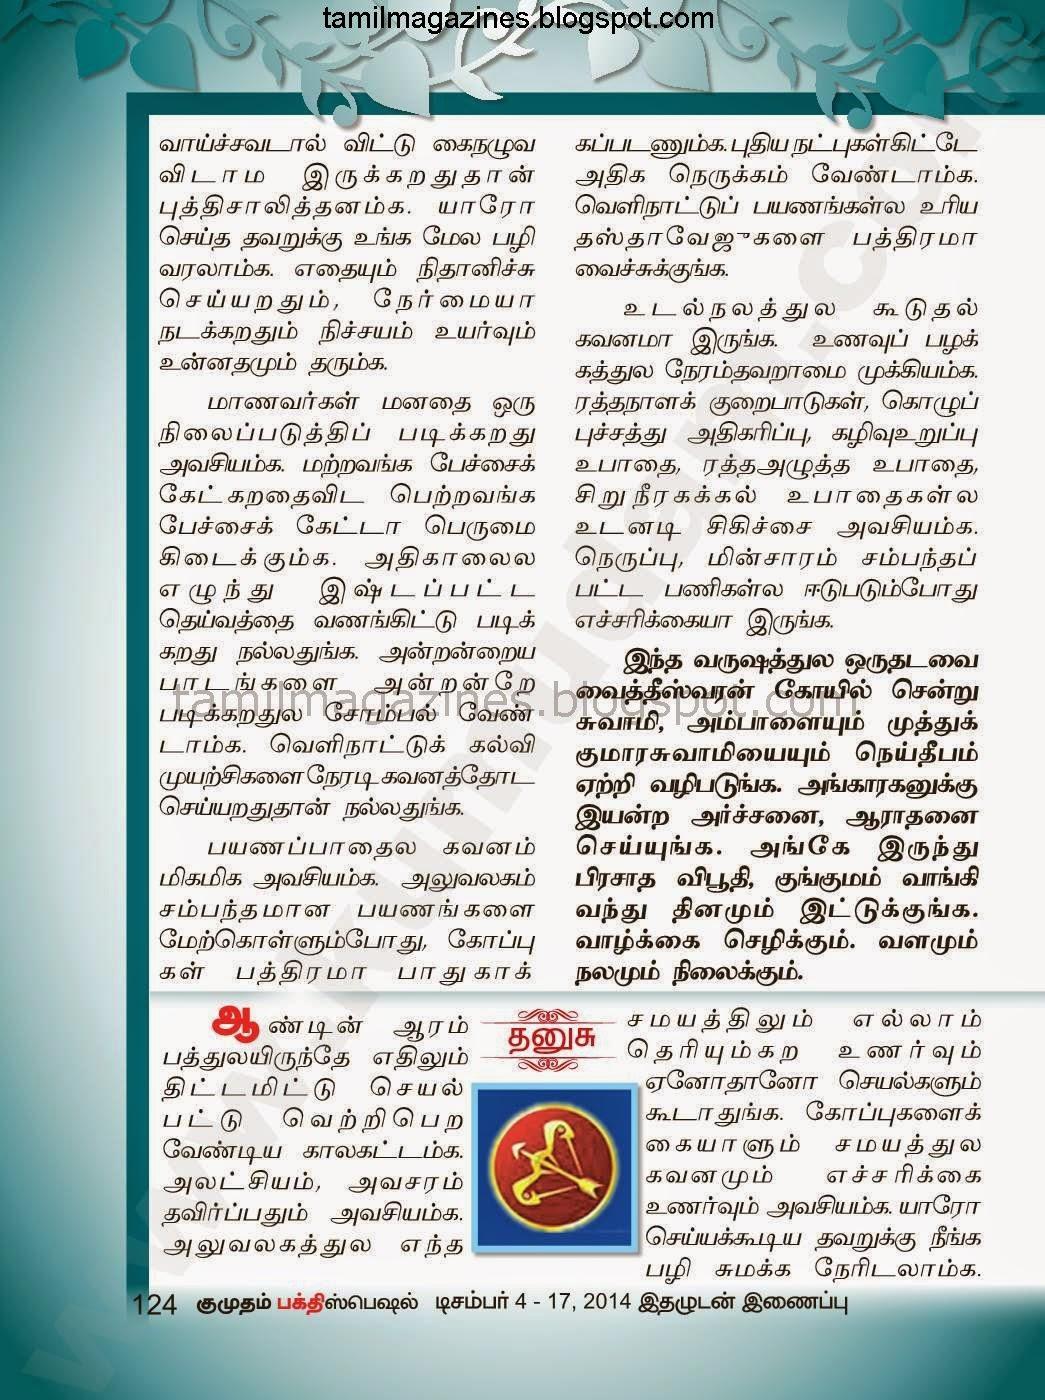 2015 New Year Rasi Palan  Kumudam Bakthi  Tamil Magazines